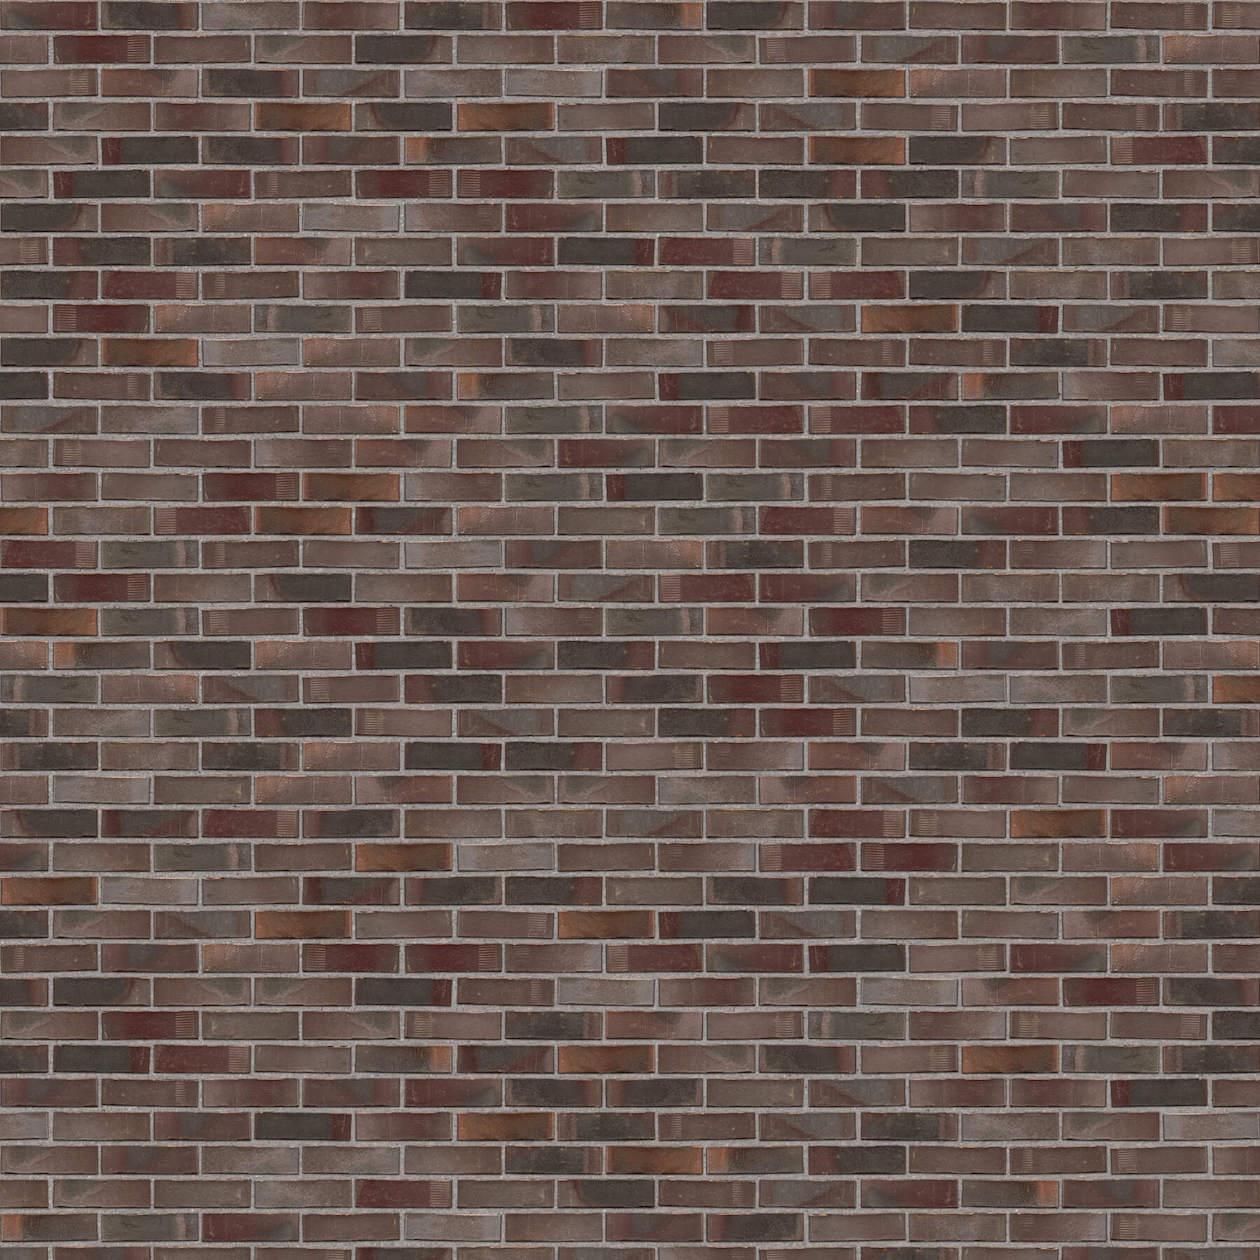 Puna-cigla-FeldHaus-Klinker-brick-house-nf-k-704-Siva Fuga